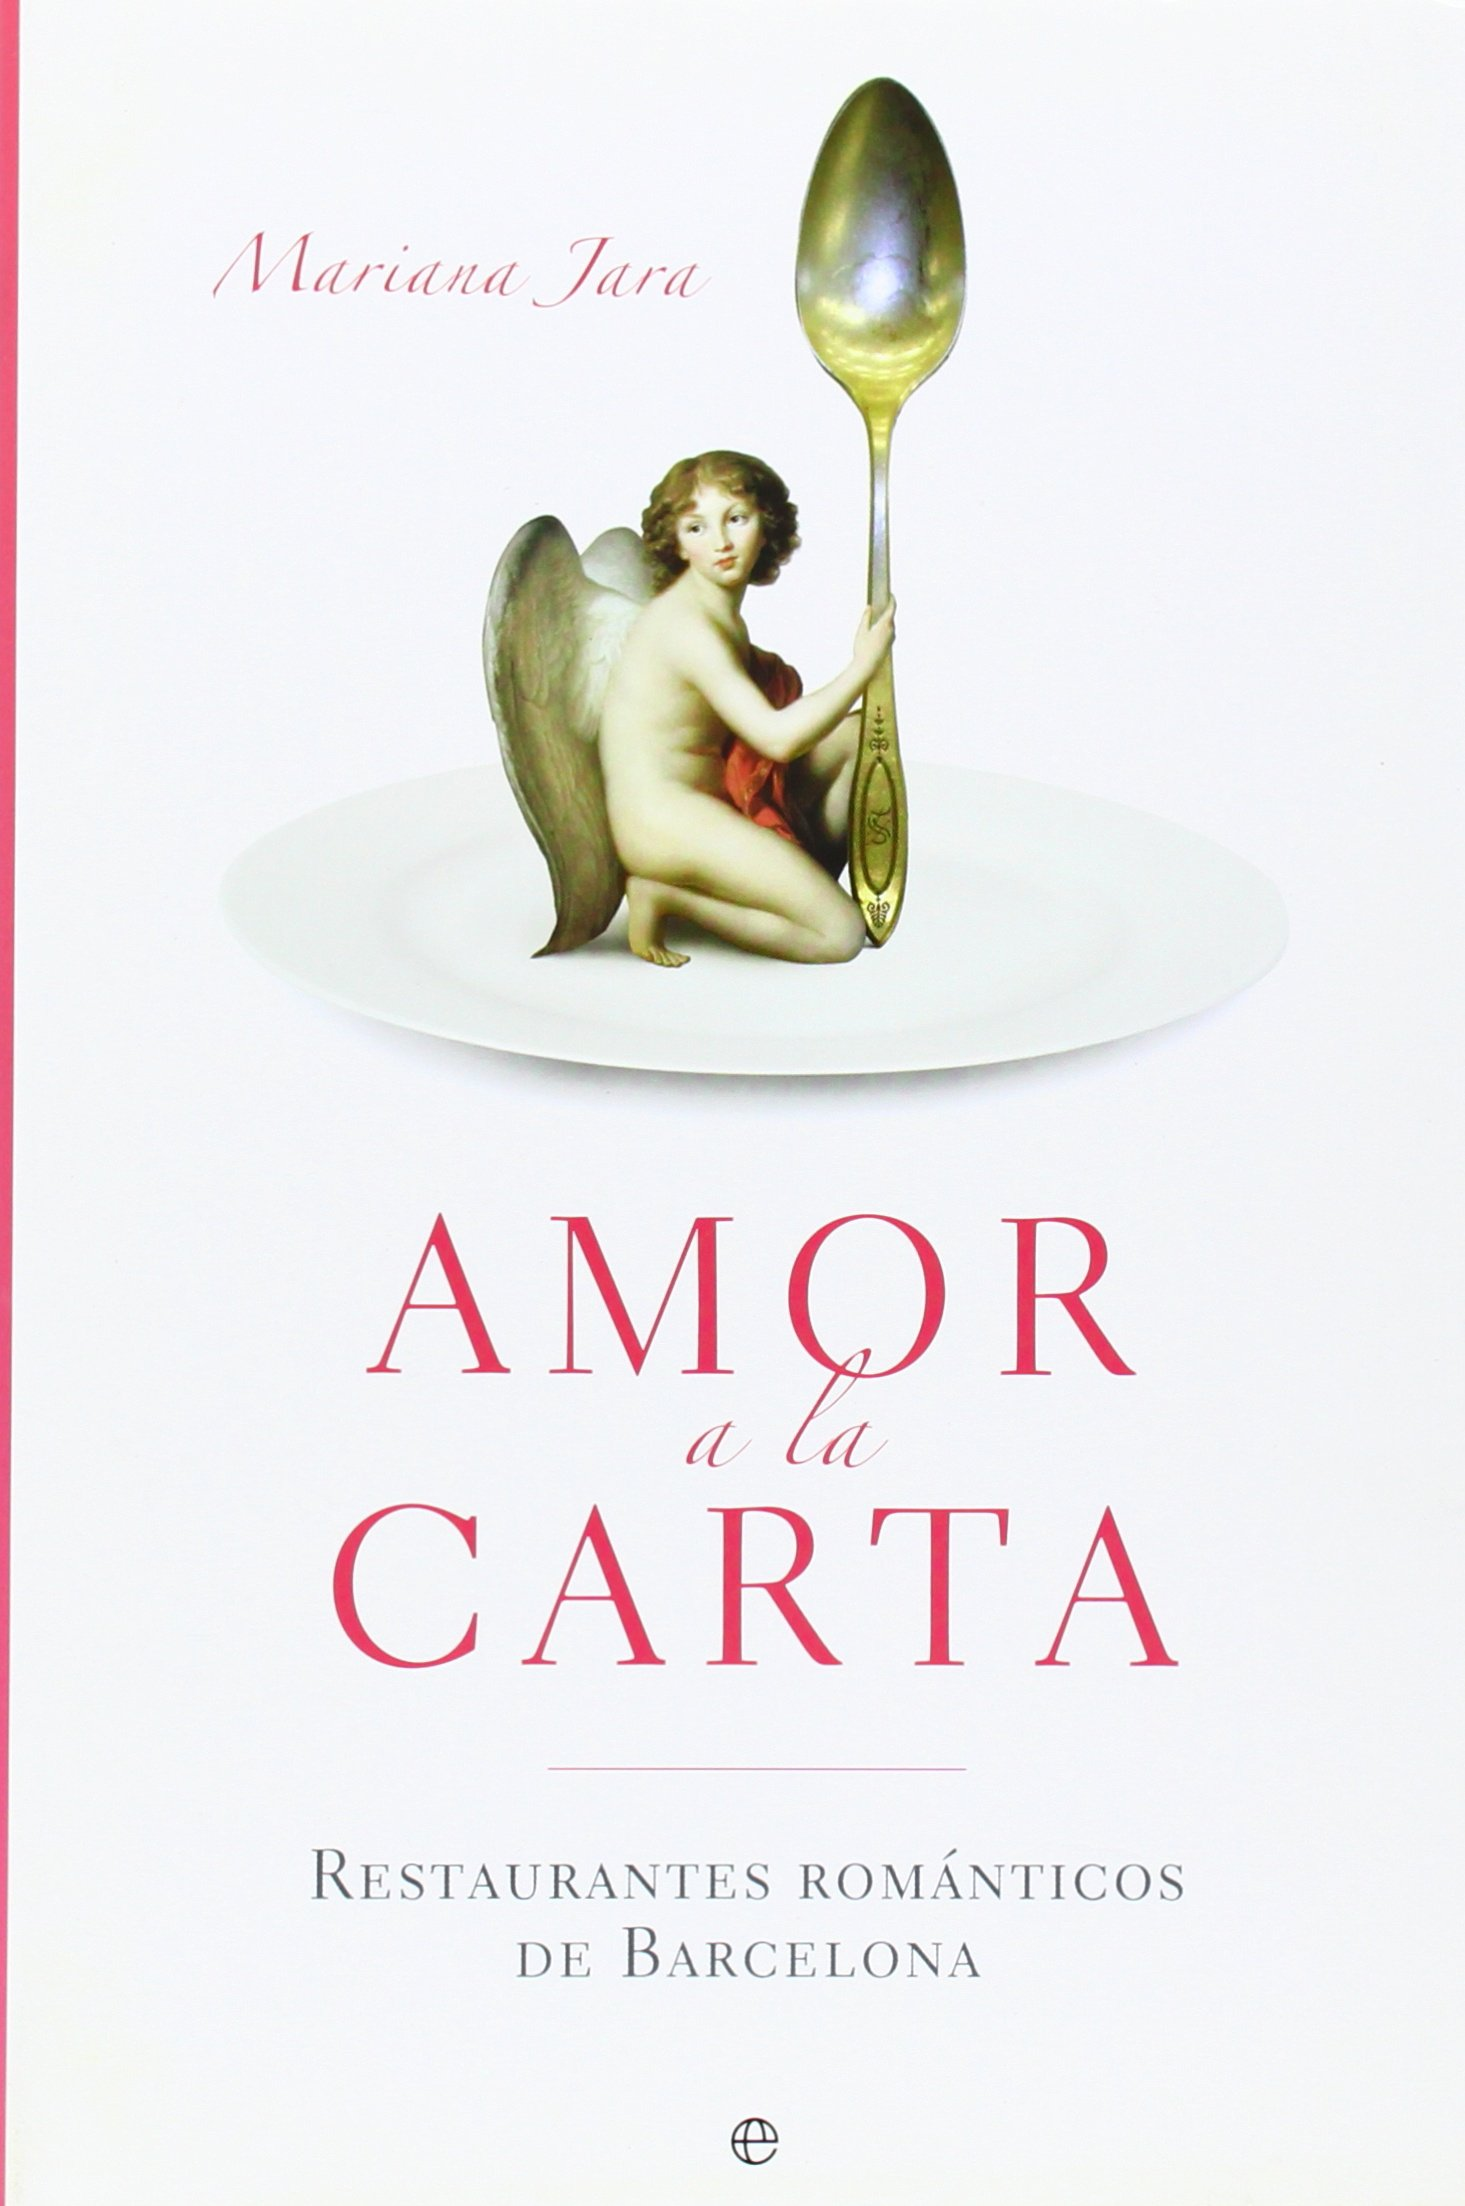 Amor a la carta: Mariana Jara: 9788497346108: Amazon.com: Books